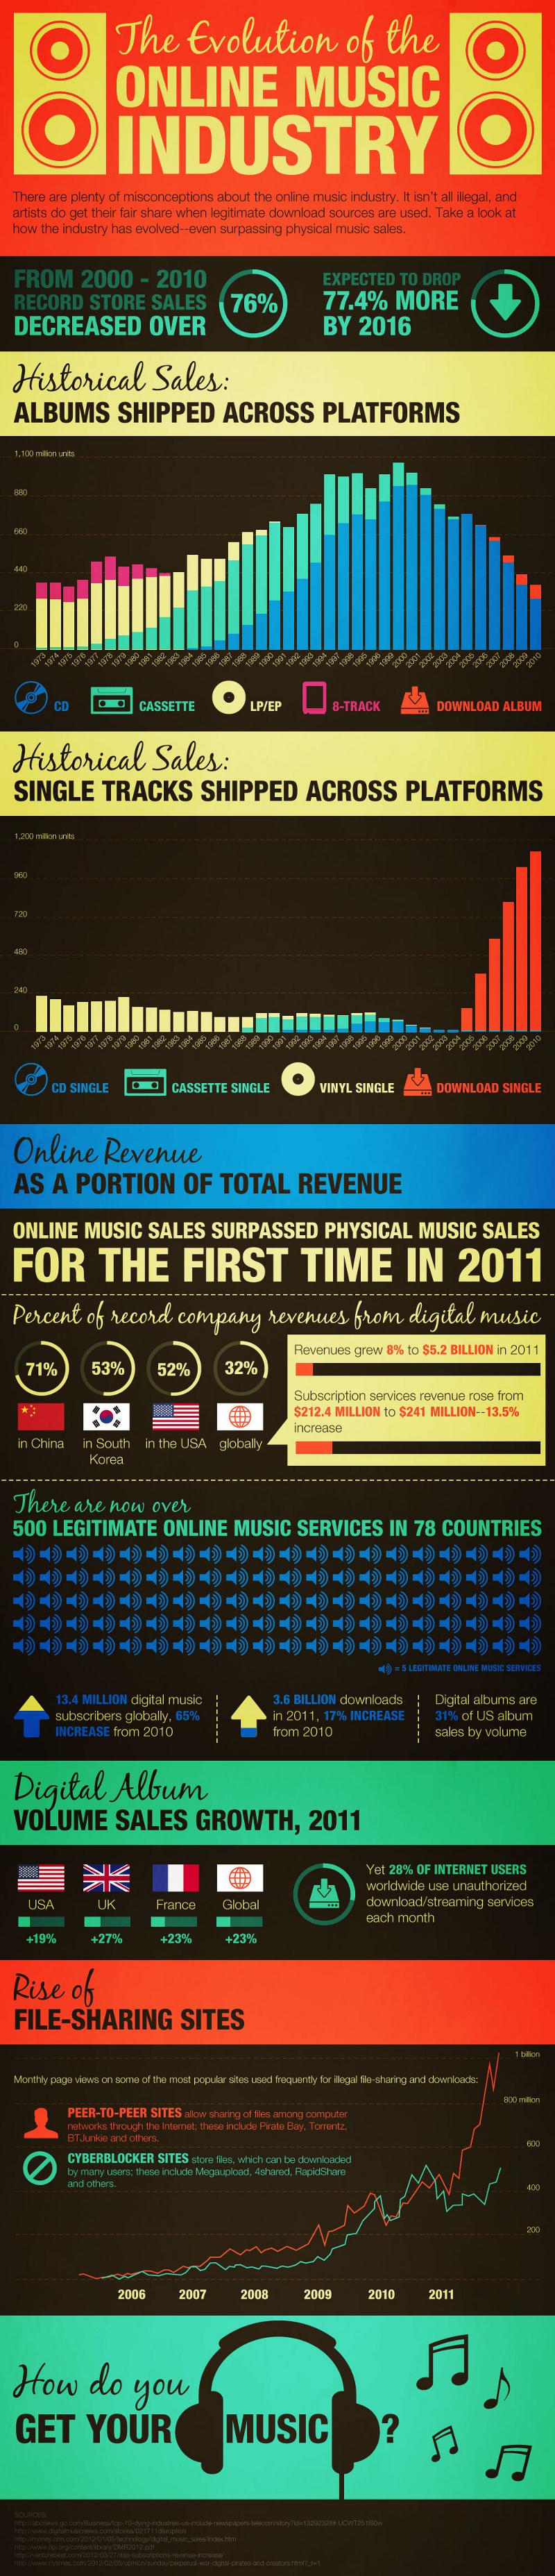 Digital Music Industry